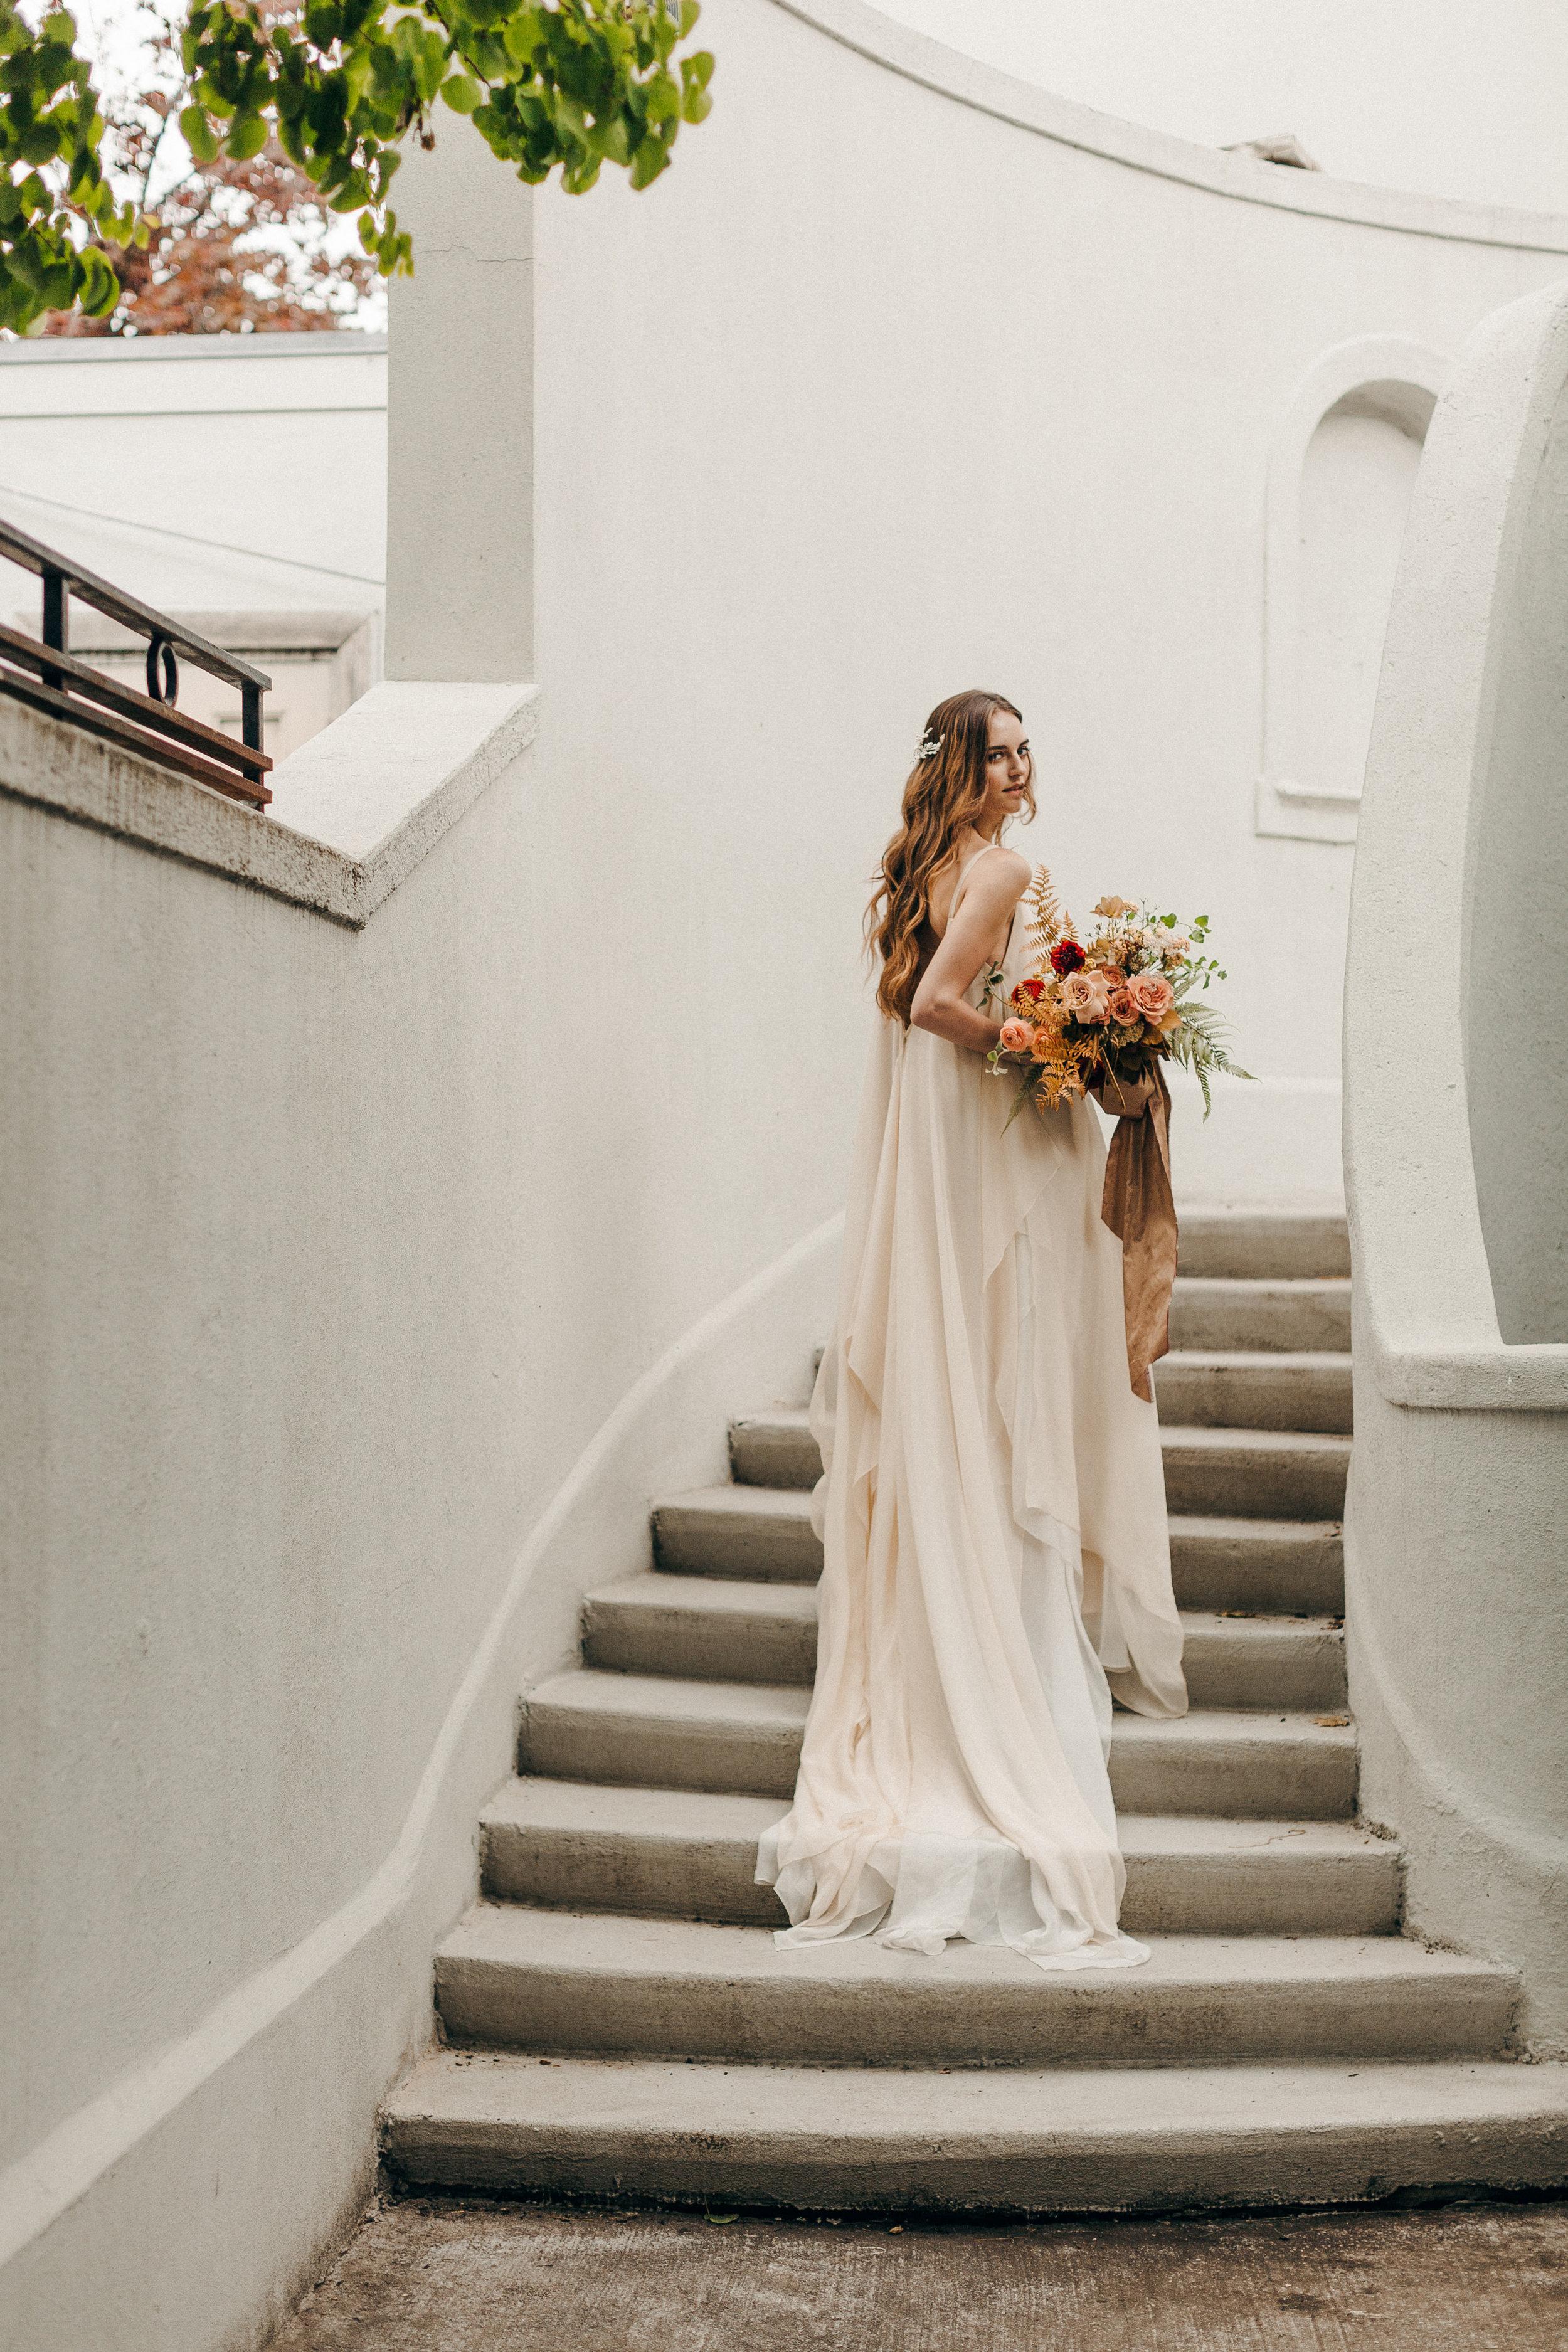 Christine-Lim-Photography-Jordana-Masi-White-Oak-Flower-Co-006.JPG